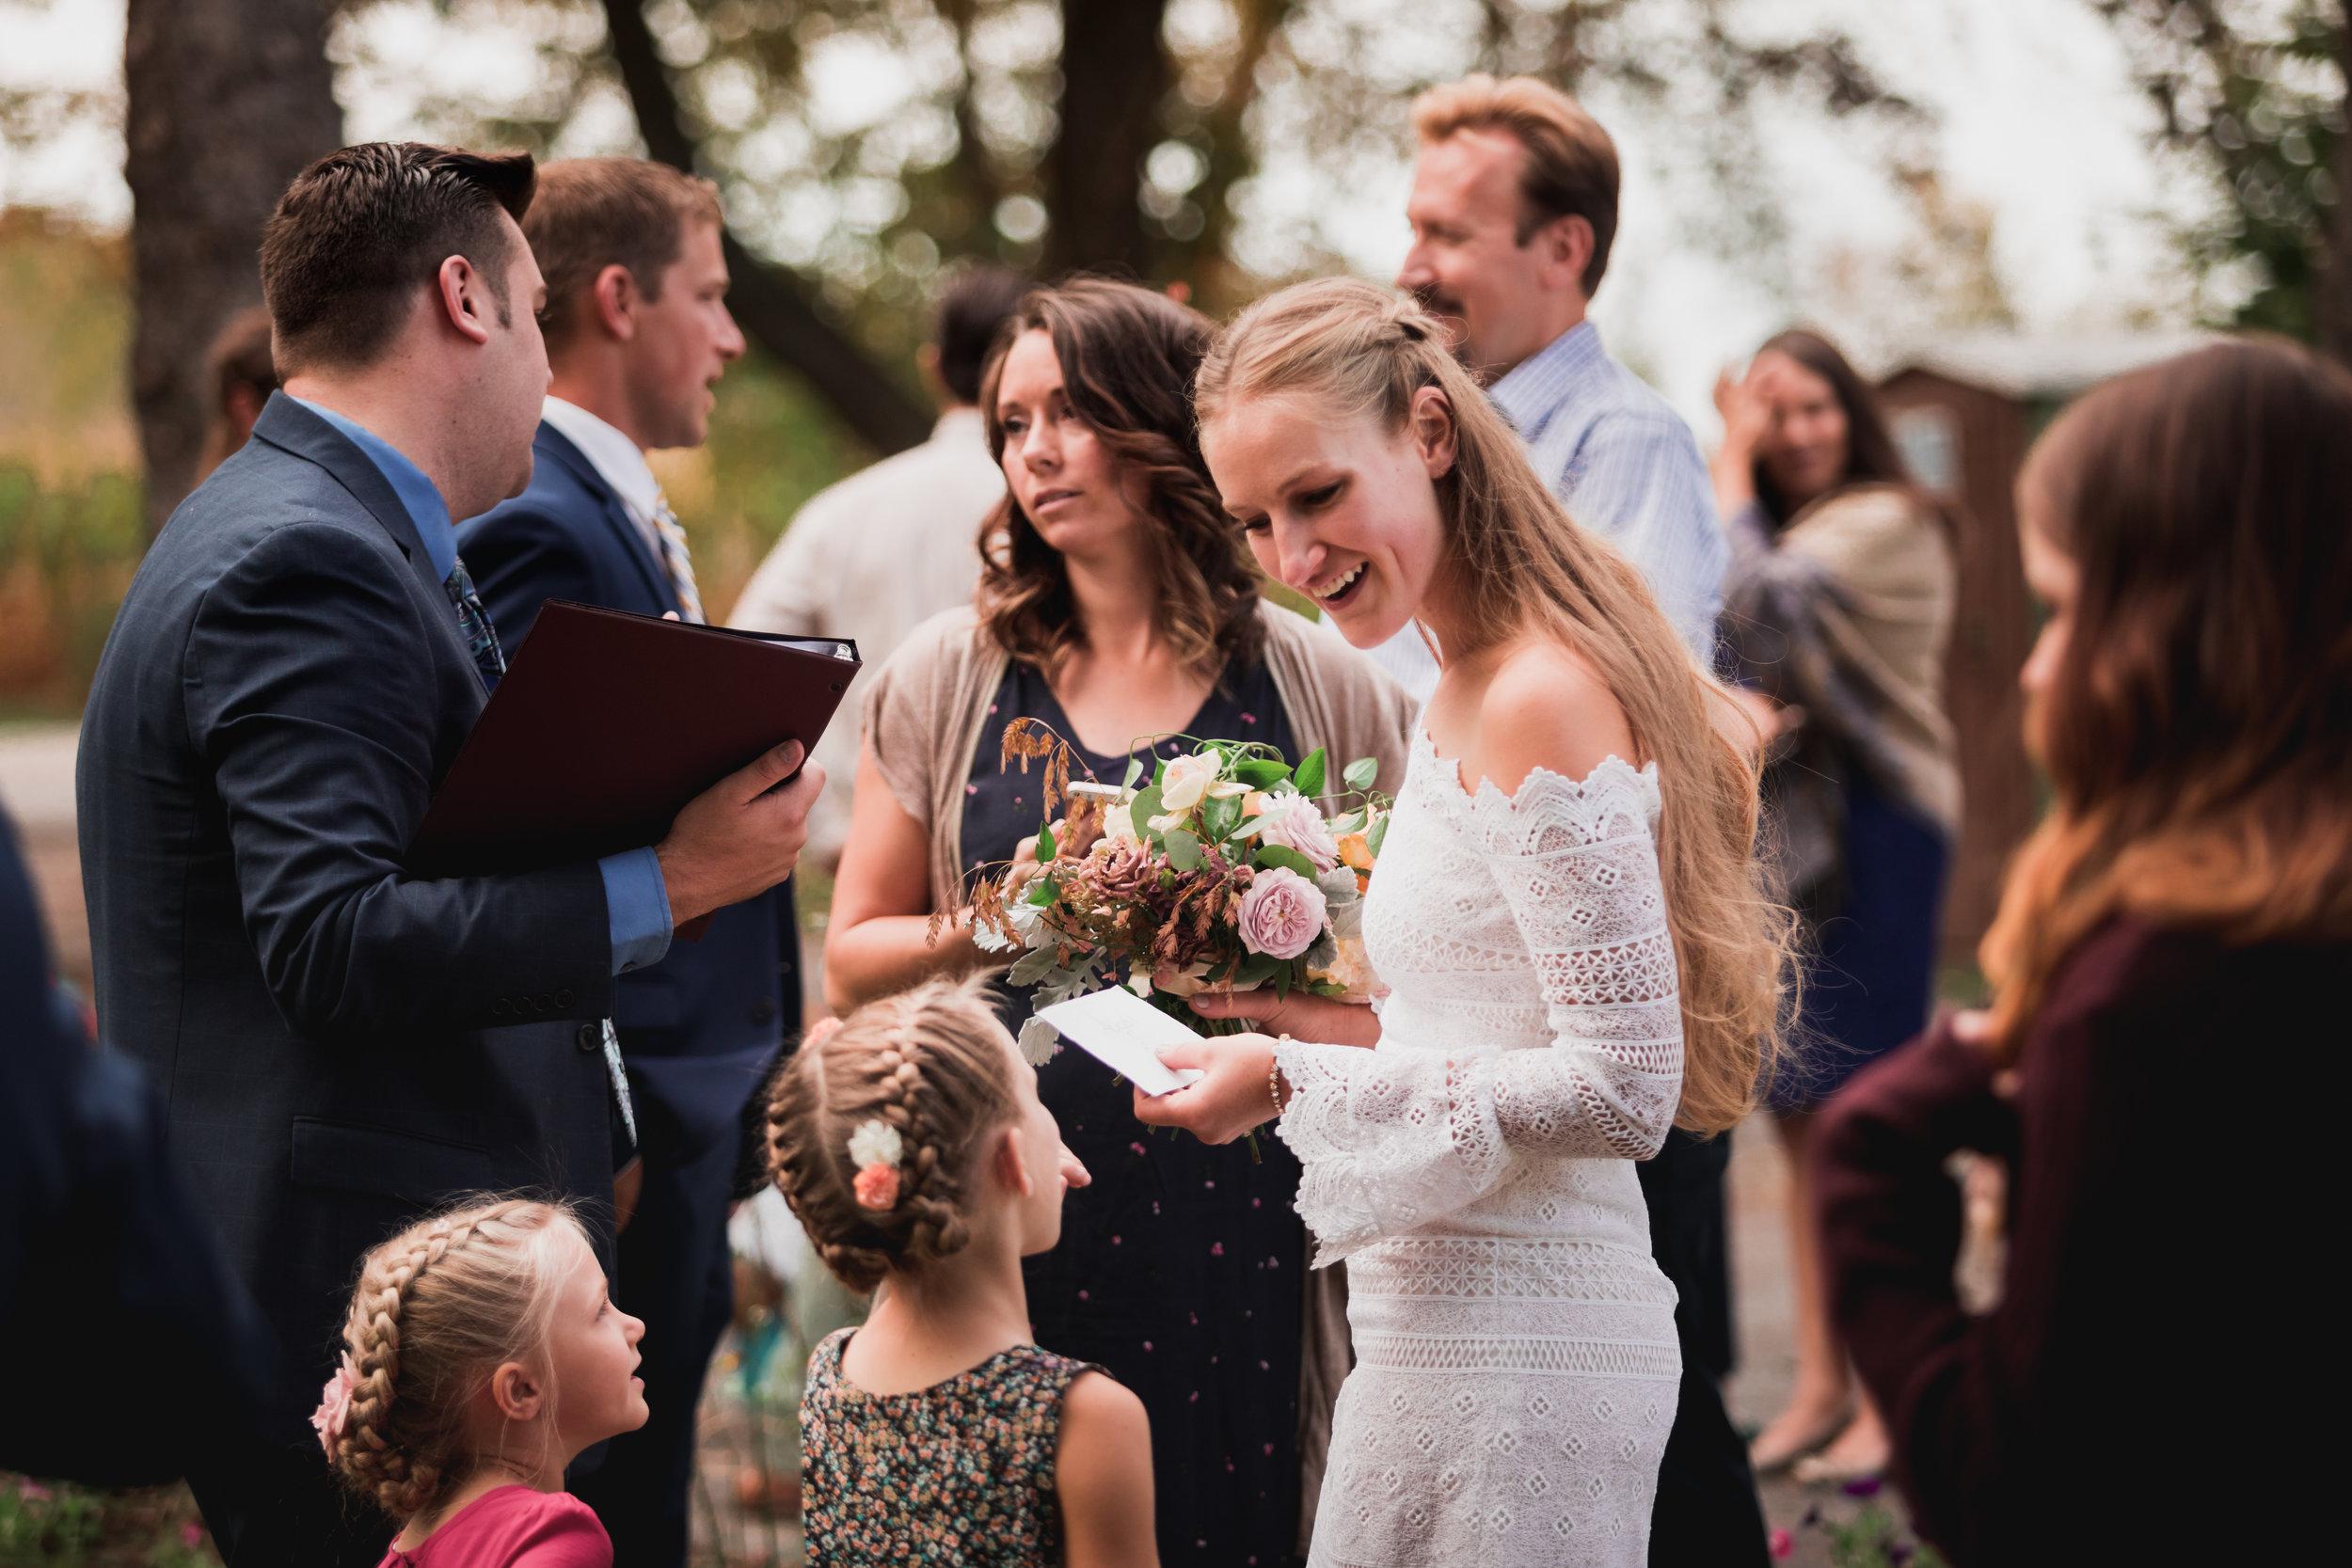 vild-photography-photographer-tahoe-intimate-wedding-adventure-van-abigail-69.jpg